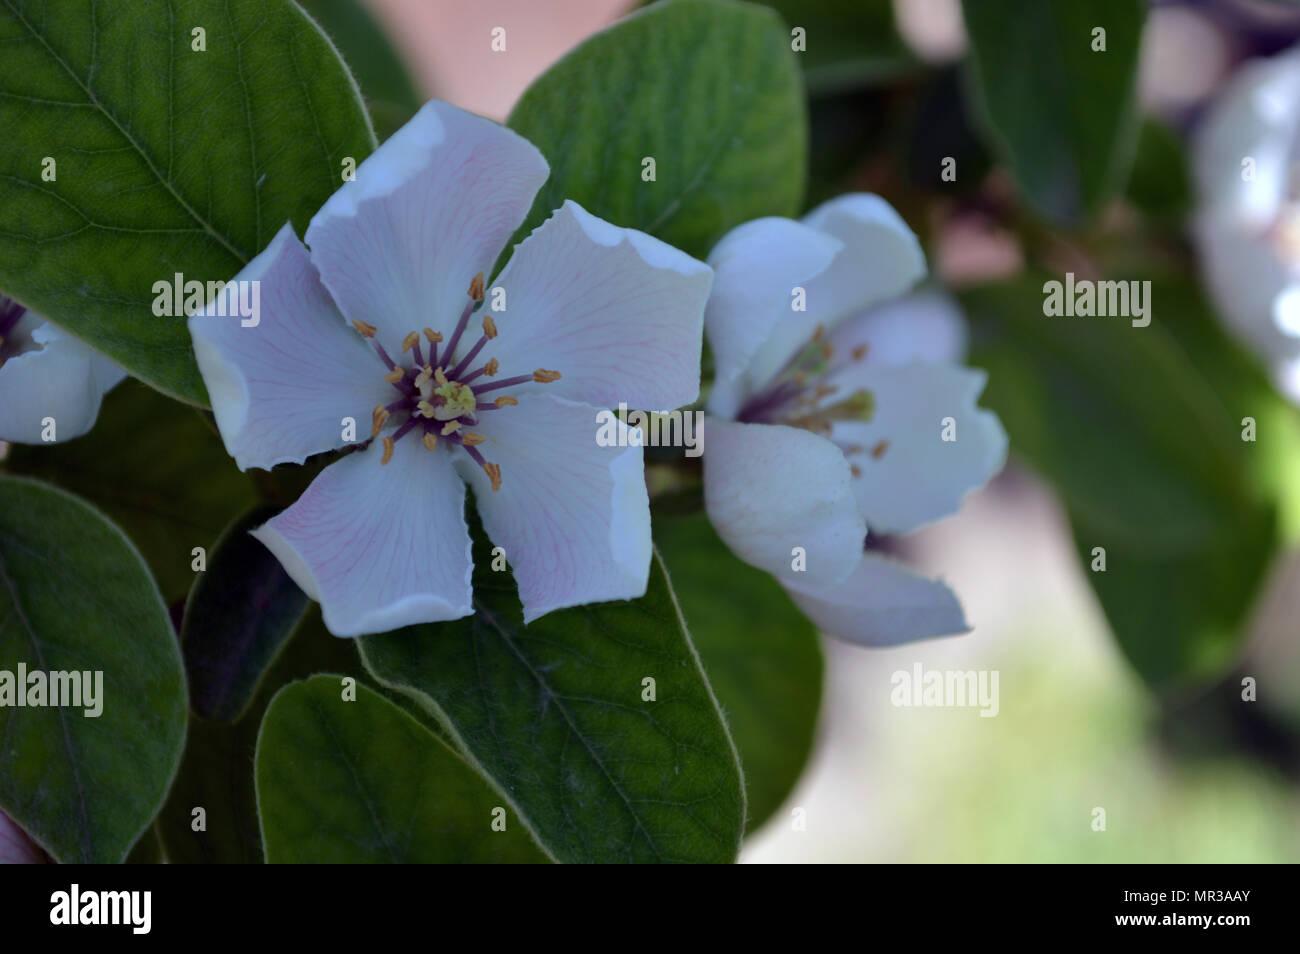 Quitte Baum Blumen in voller Blüte Detail Stockbild